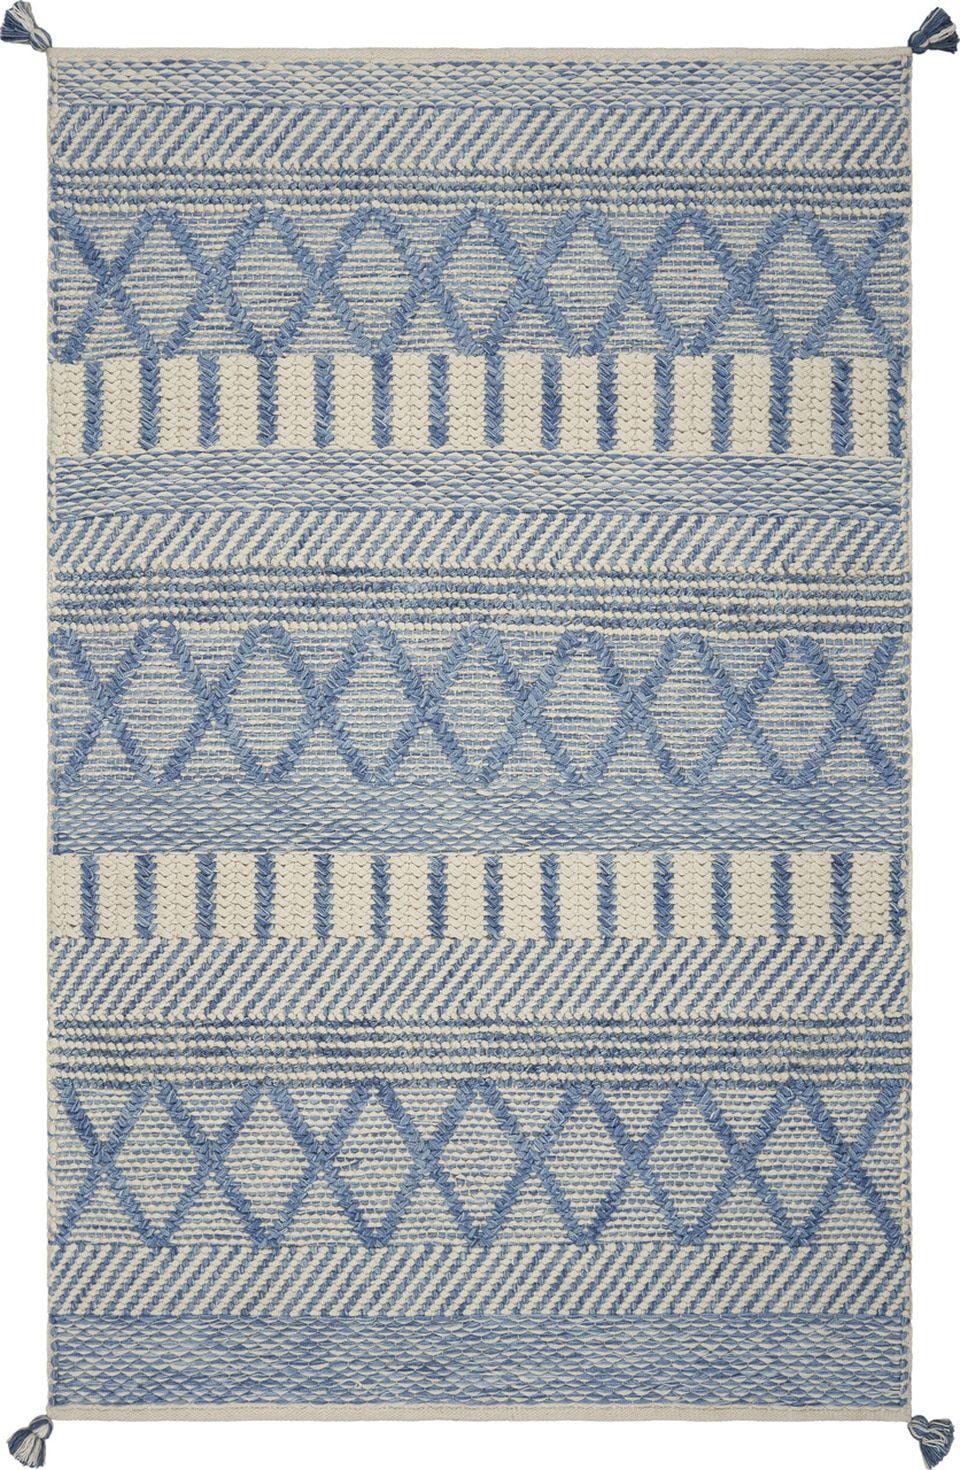 Hang Ten Santa Cruz Denim Rug Hang Ten Area Rugs Rugs On Carpet [ 1470 x 960 Pixel ]